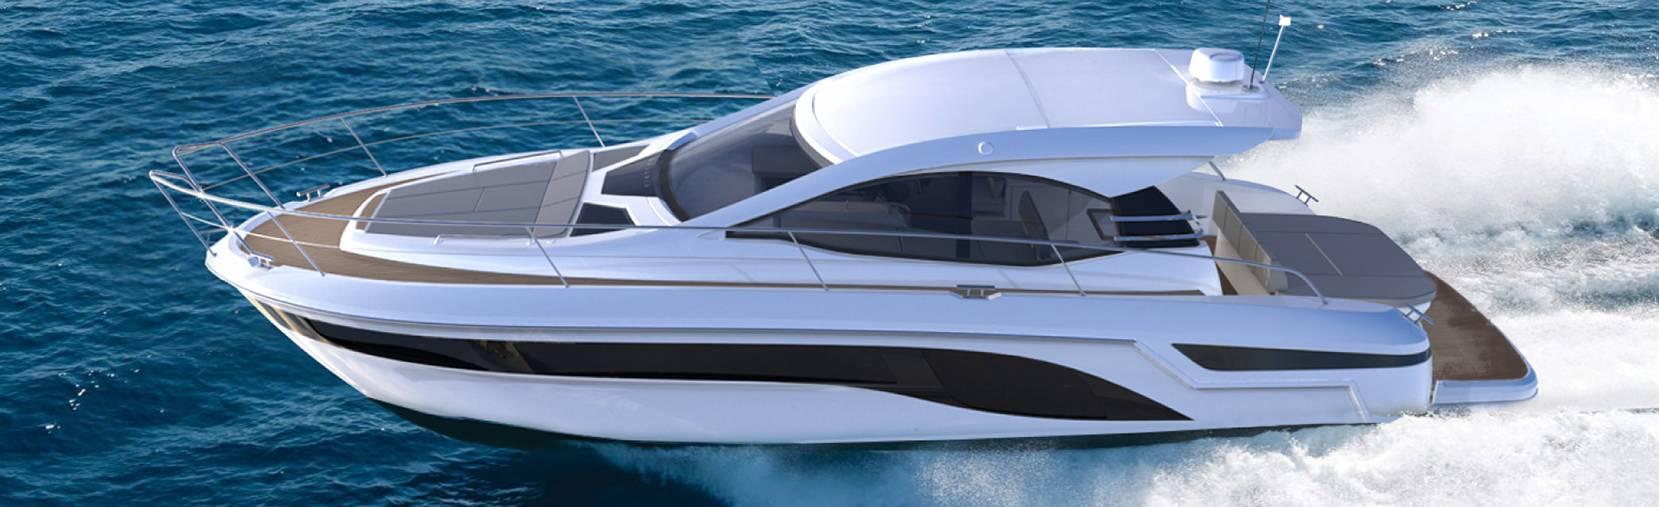 Bavaria sr41 boat